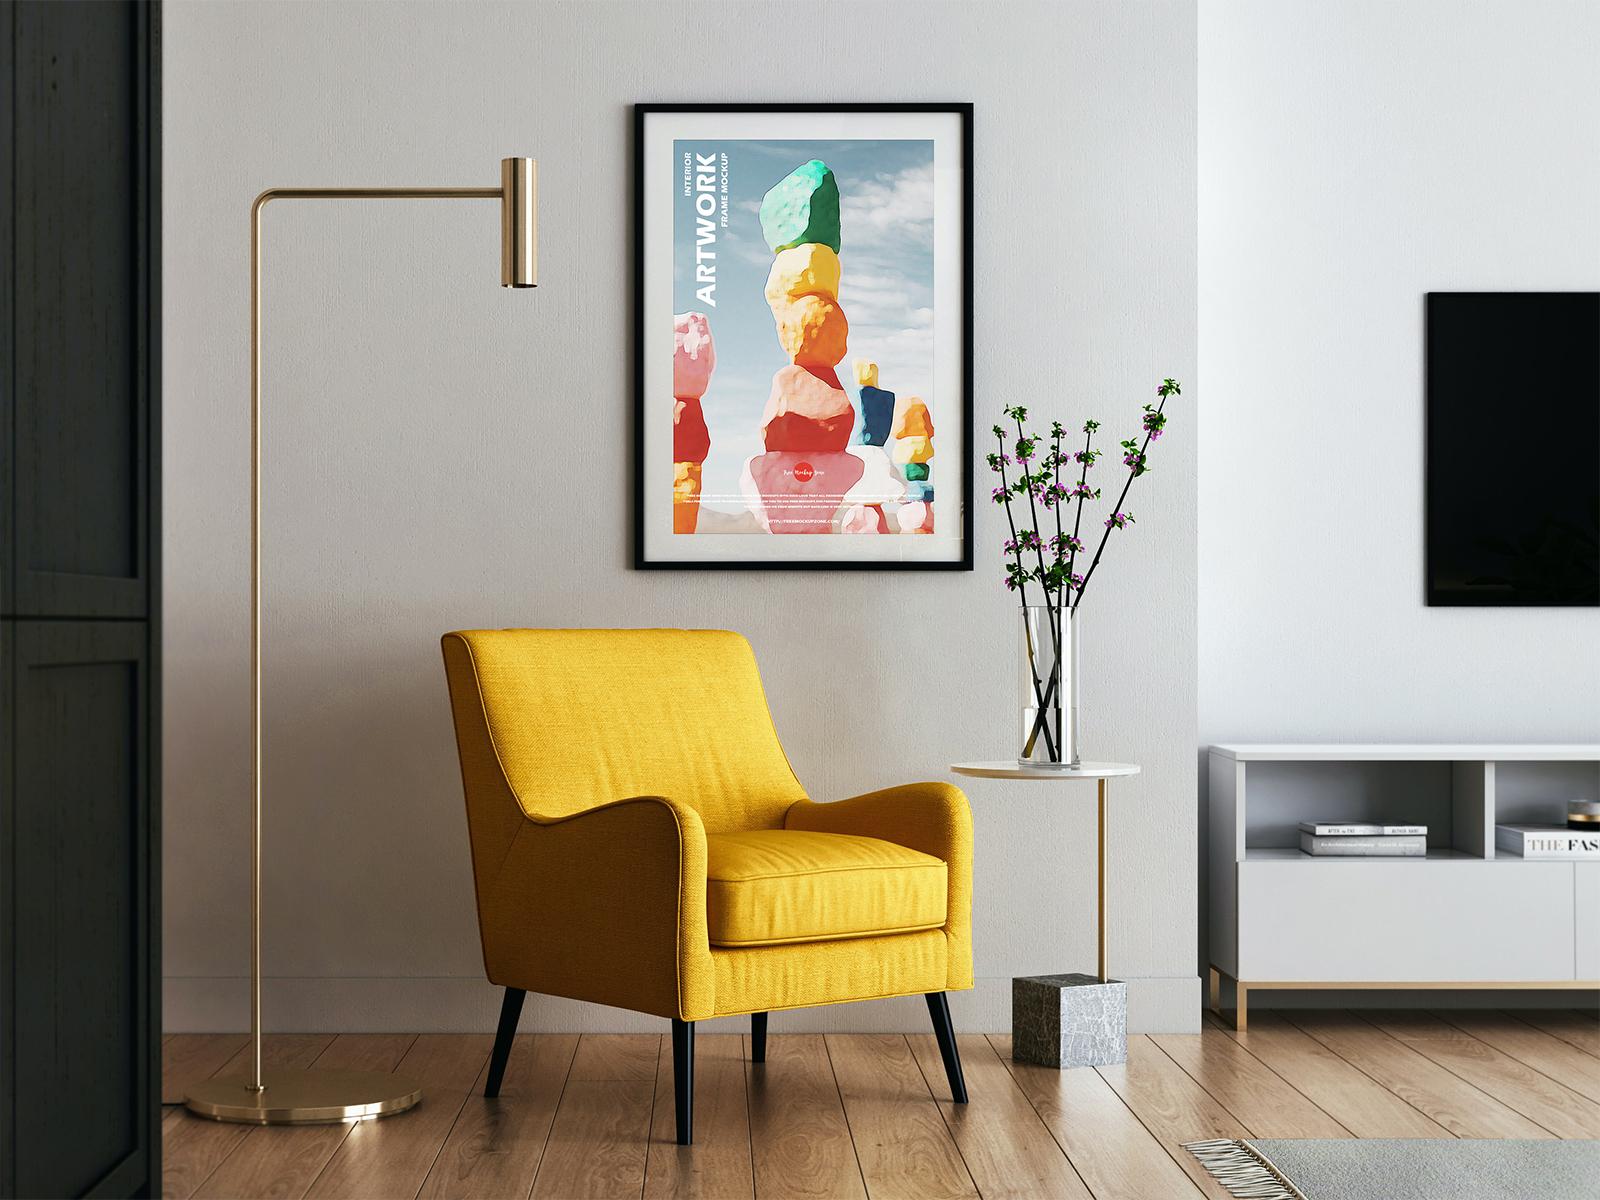 Modern Interior Poster Frame Free Mockup